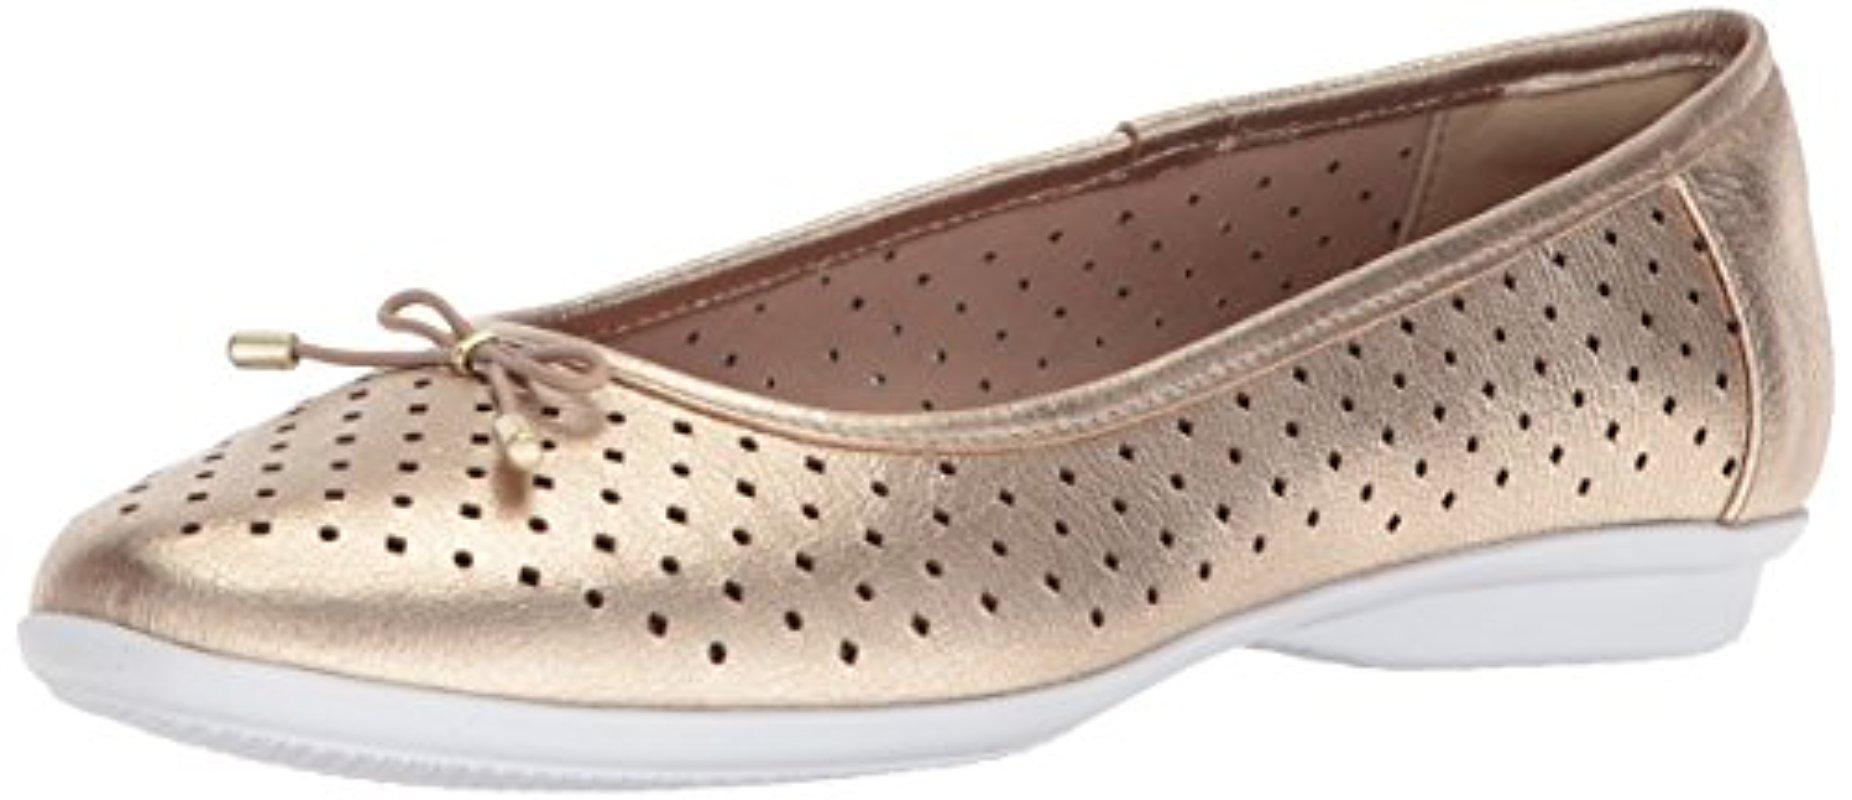 Clarks Gracelin Perforated Leather Ballet Flat ePtNO